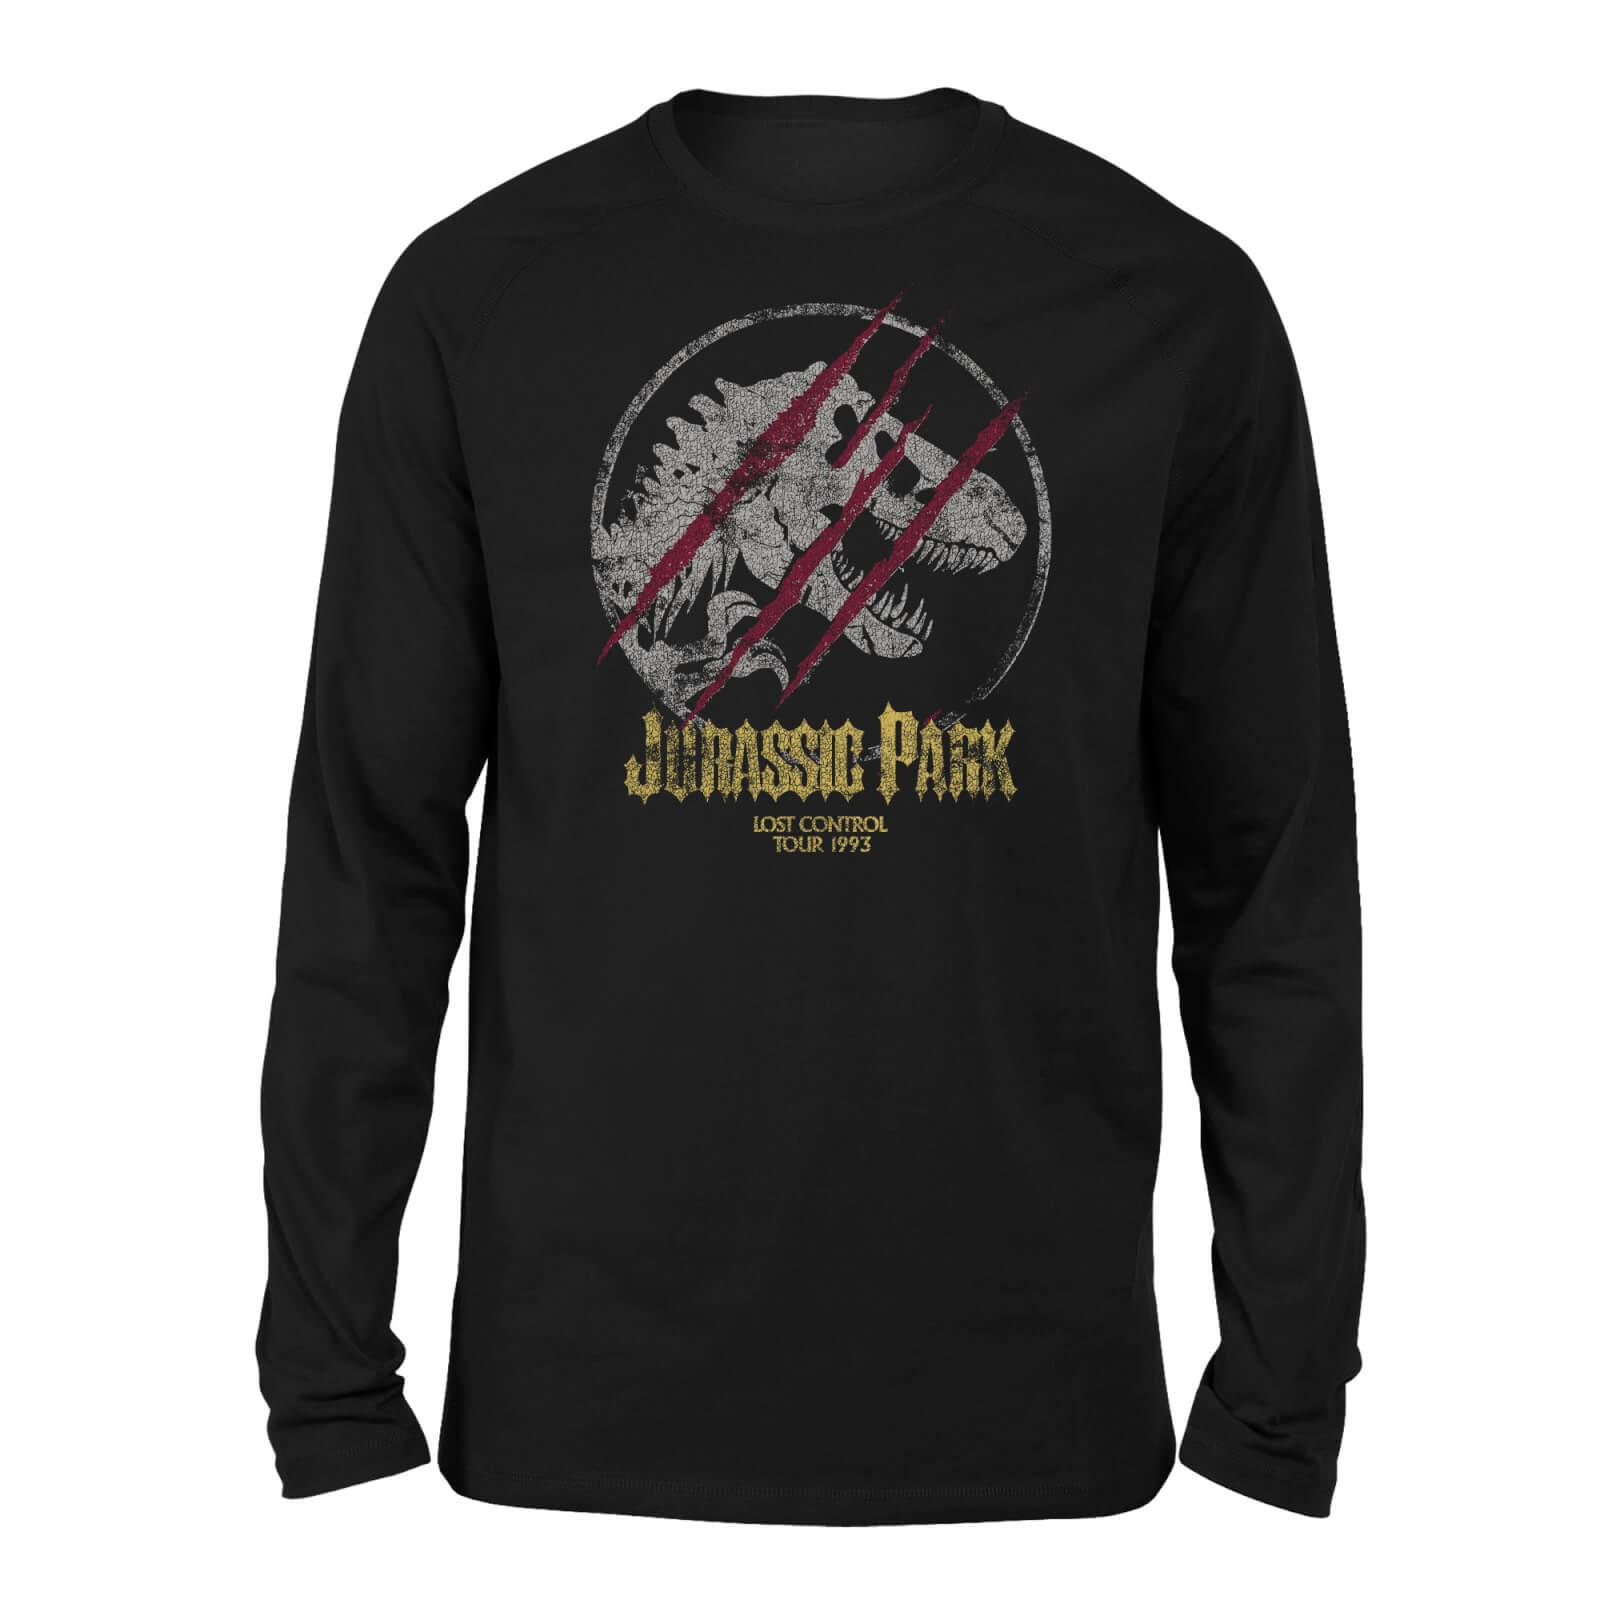 Jurassic Park Lost Control Unisex Long Sleeved T-Shirt - Black - XL